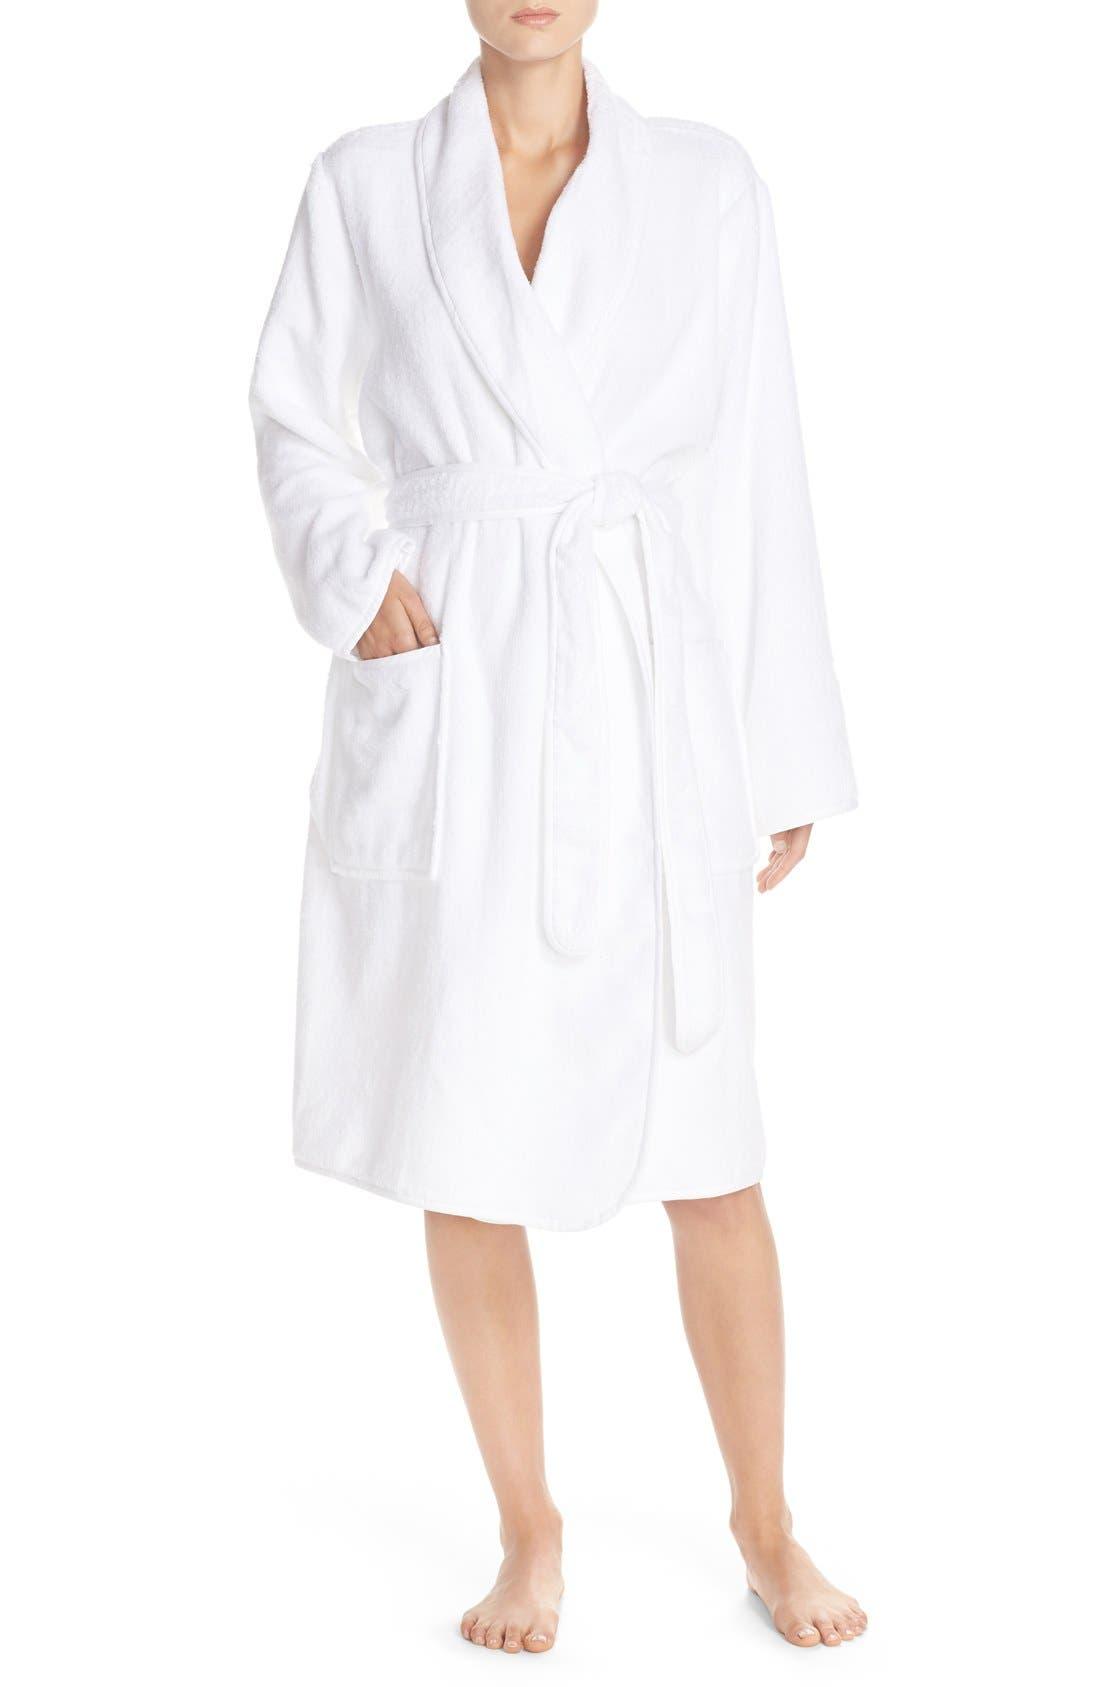 Naked Terry Cotton Robe